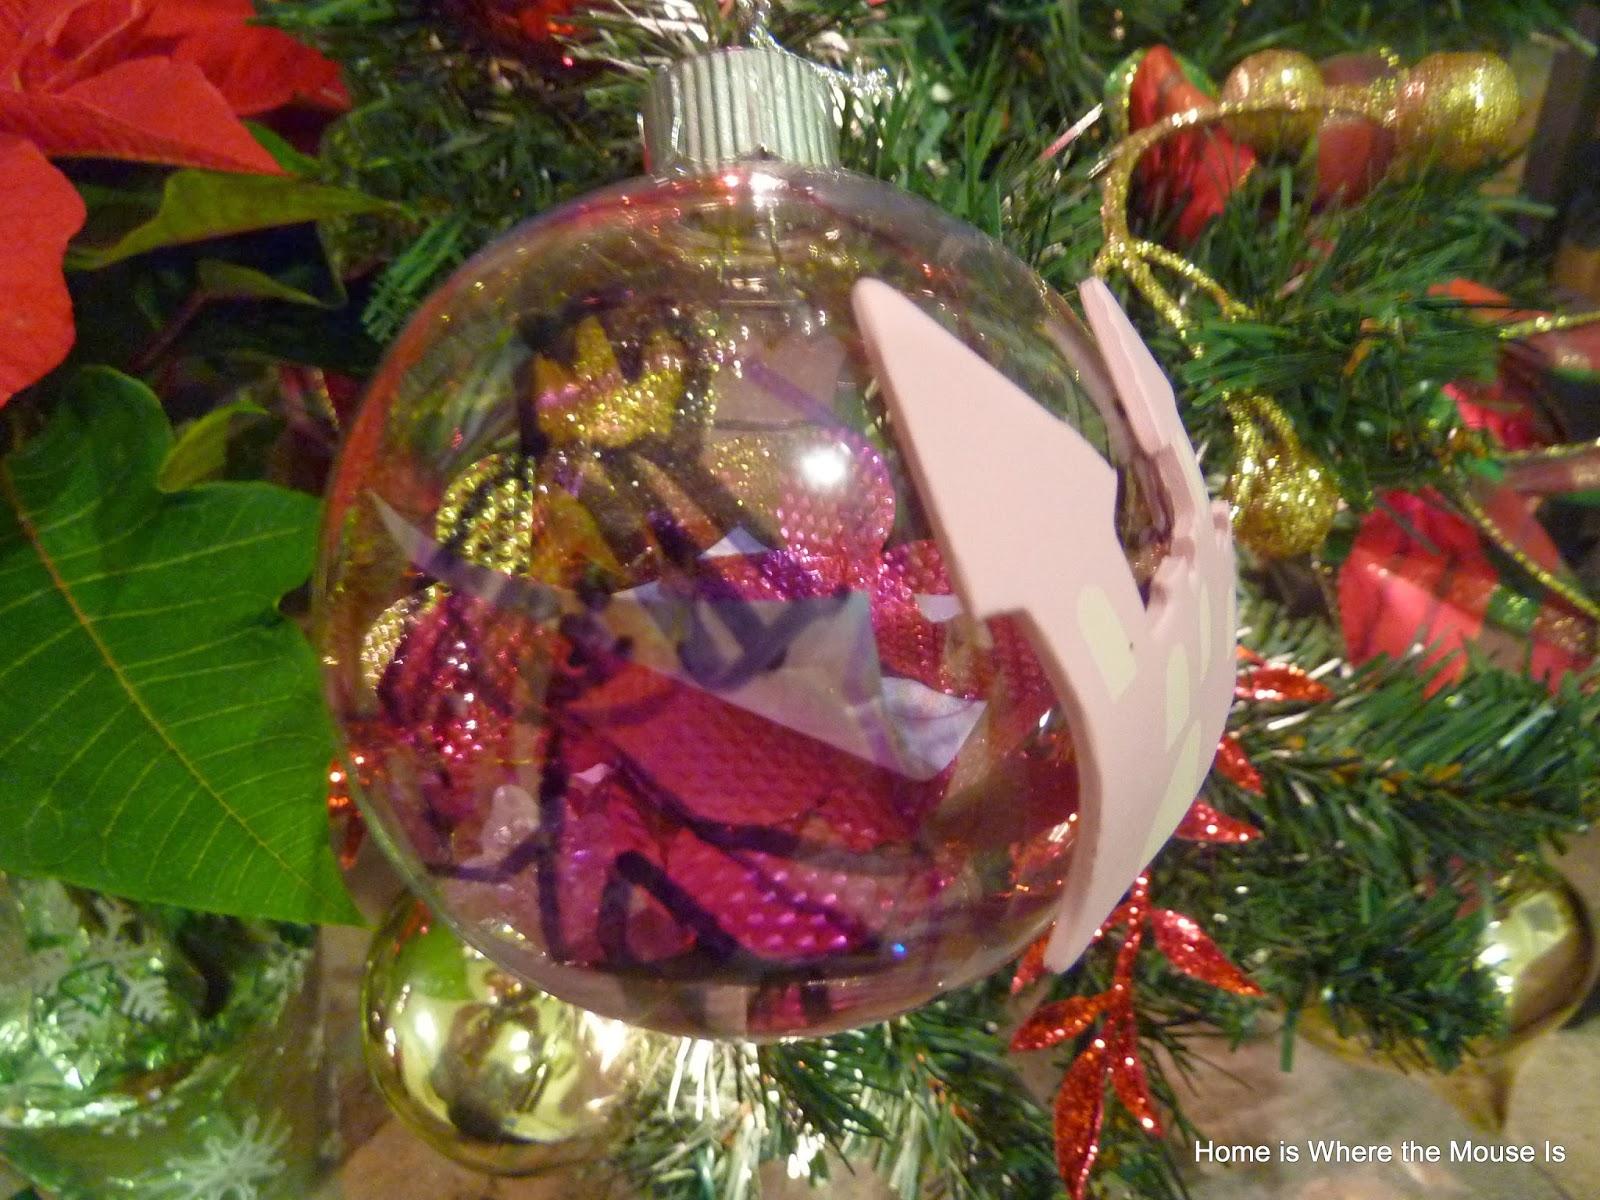 Disney christmas decorations for home - Disney Vacation Memories Christmas Ornaments